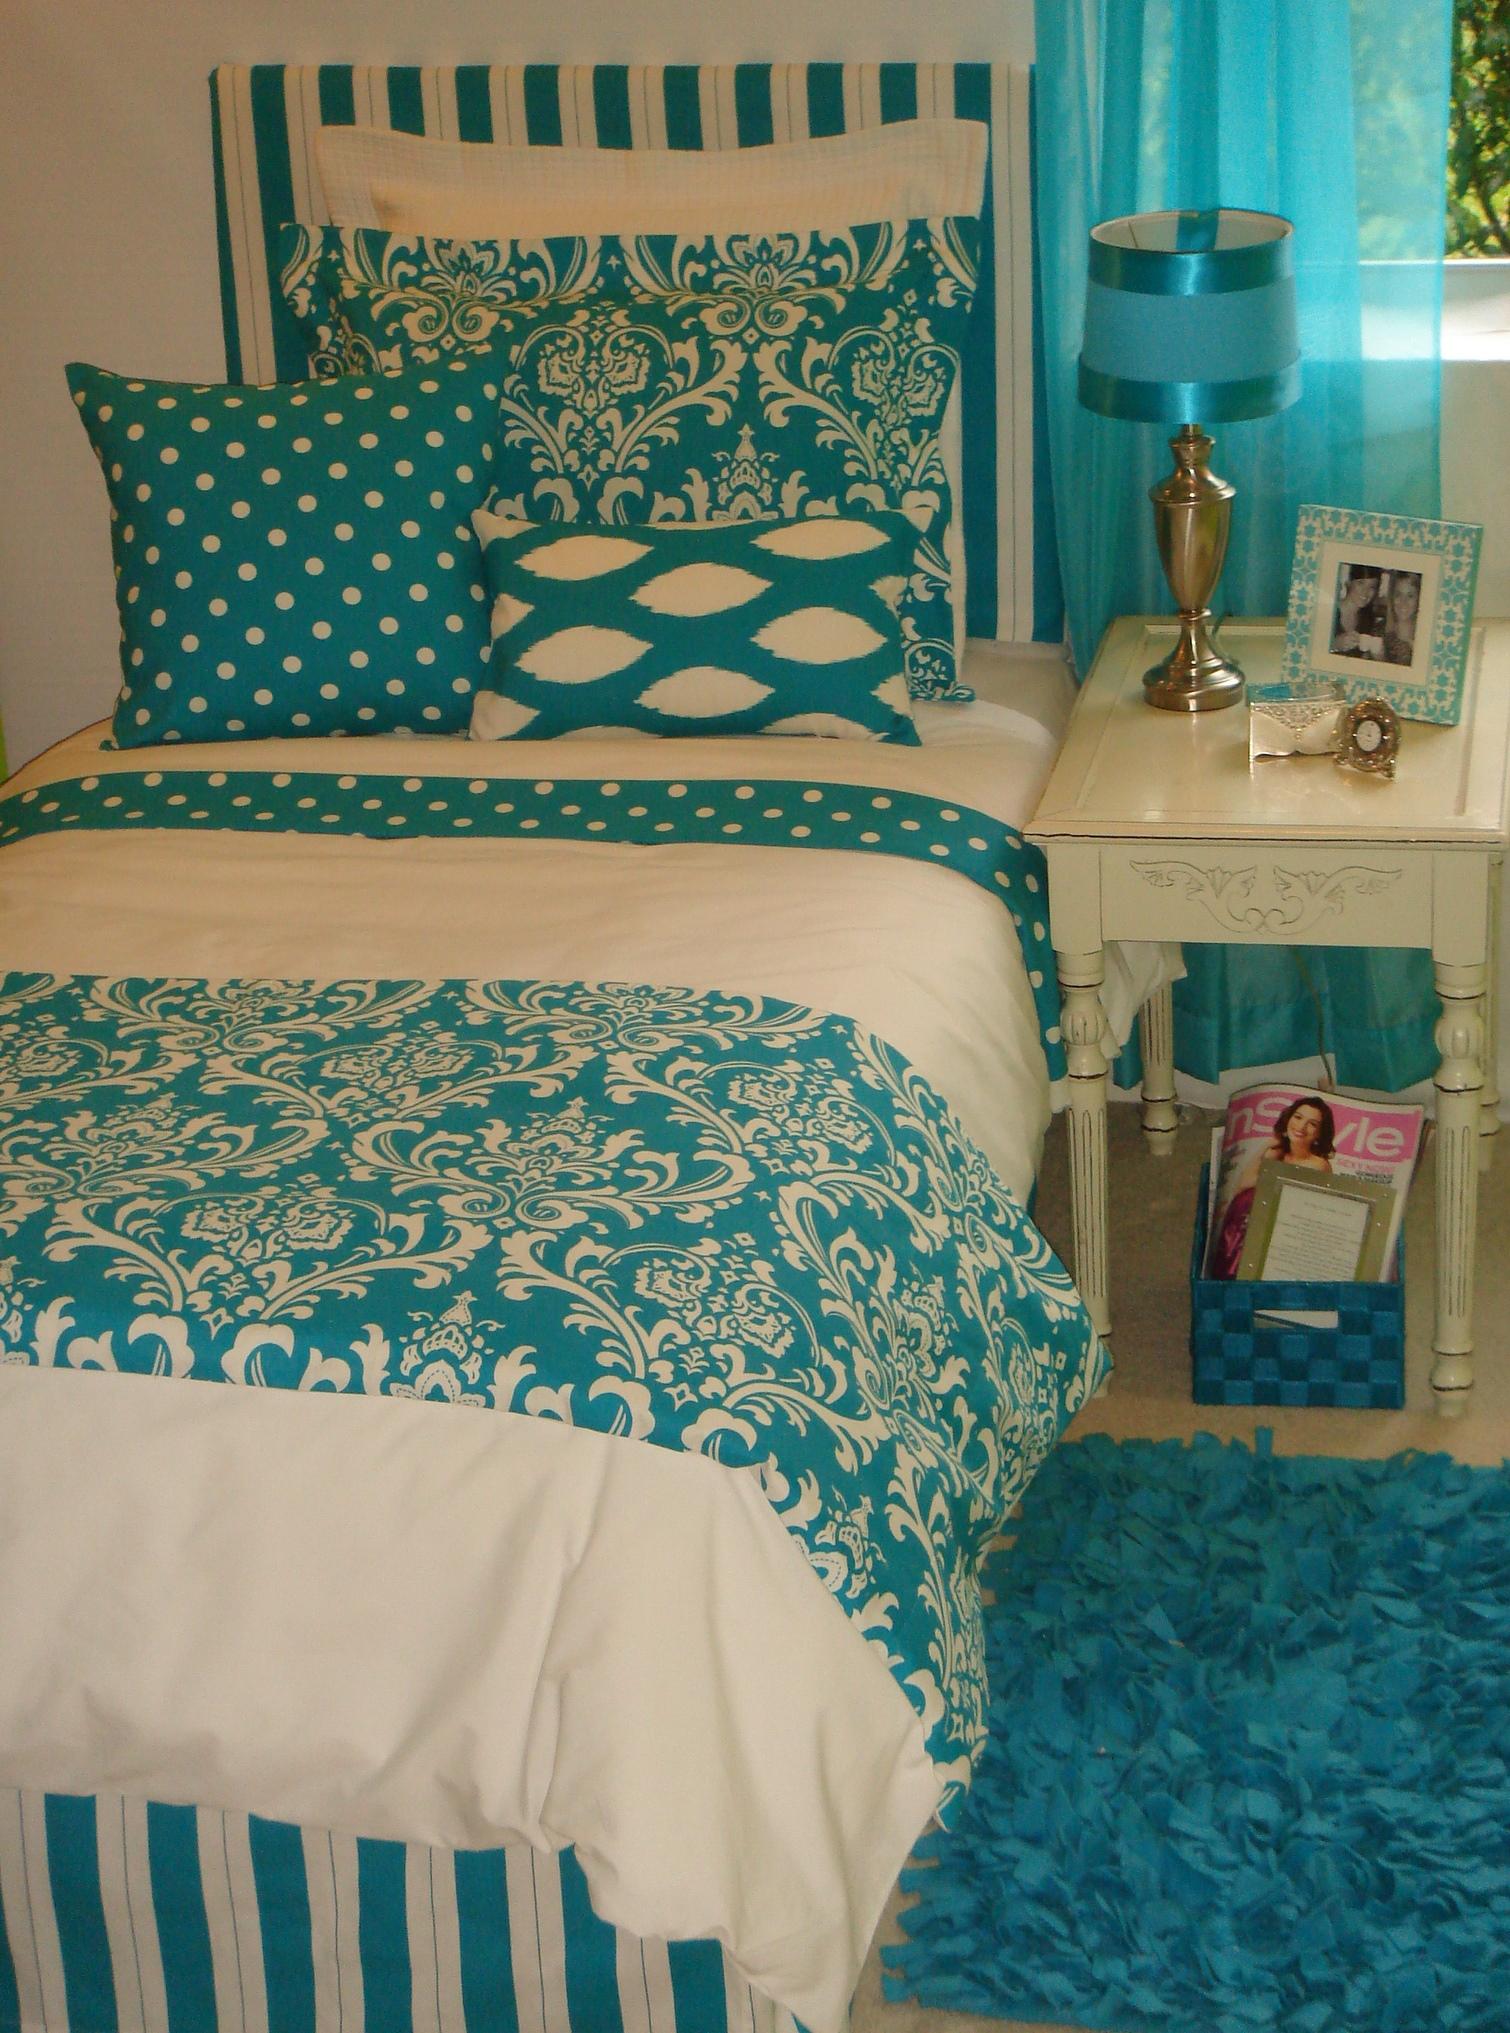 Teal Dorm Room Bedding Spotlats